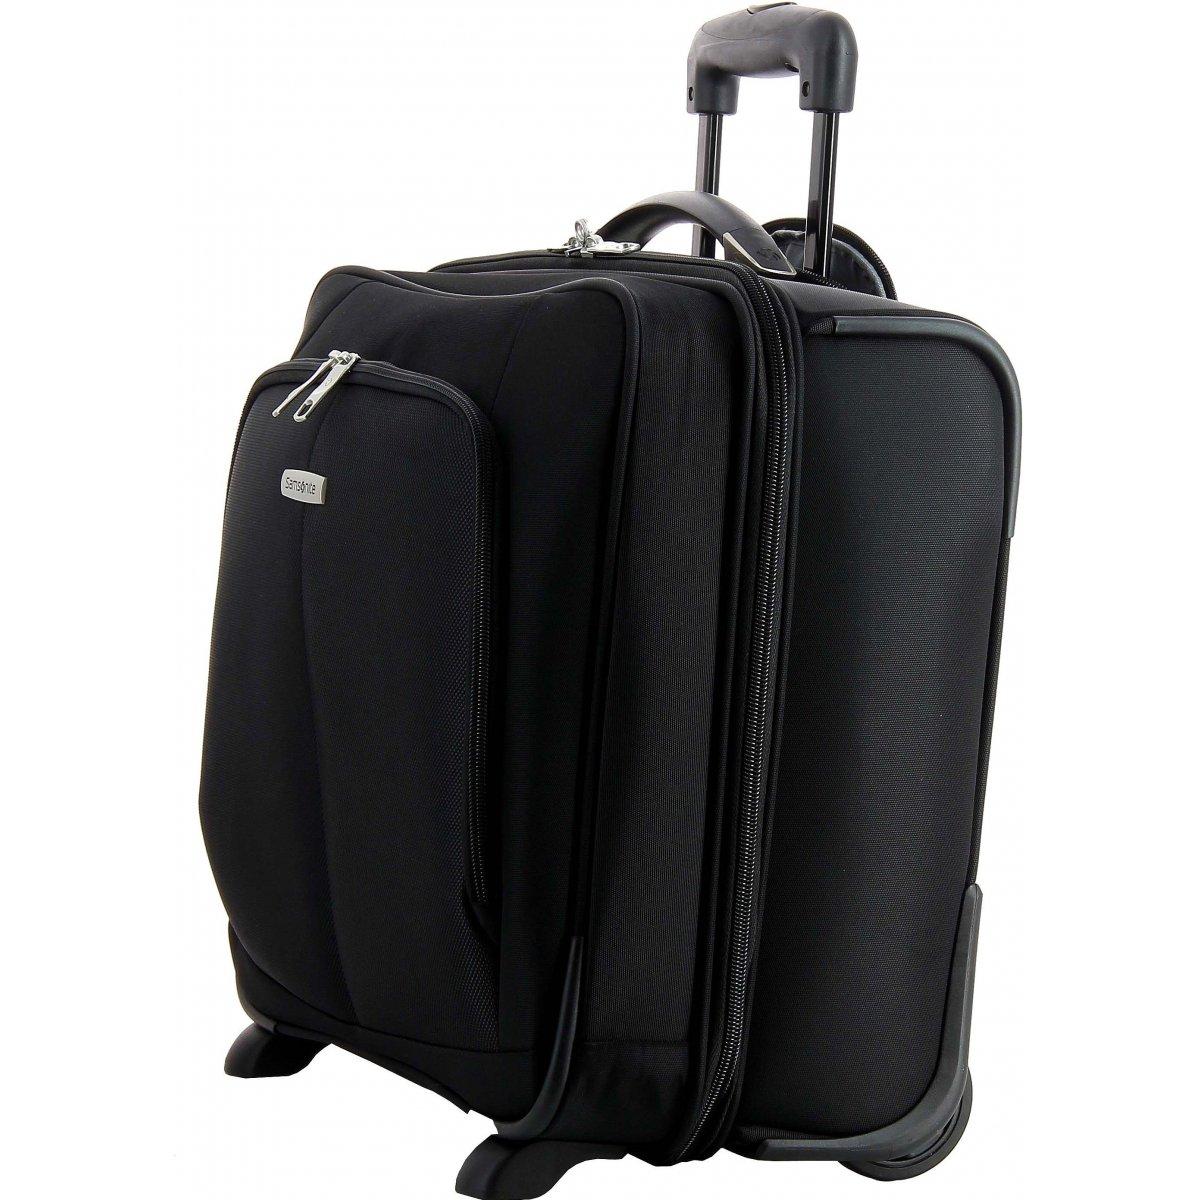 pilot case porte ordinateur toploader 16 samsonite intellio36 couleur principale black. Black Bedroom Furniture Sets. Home Design Ideas